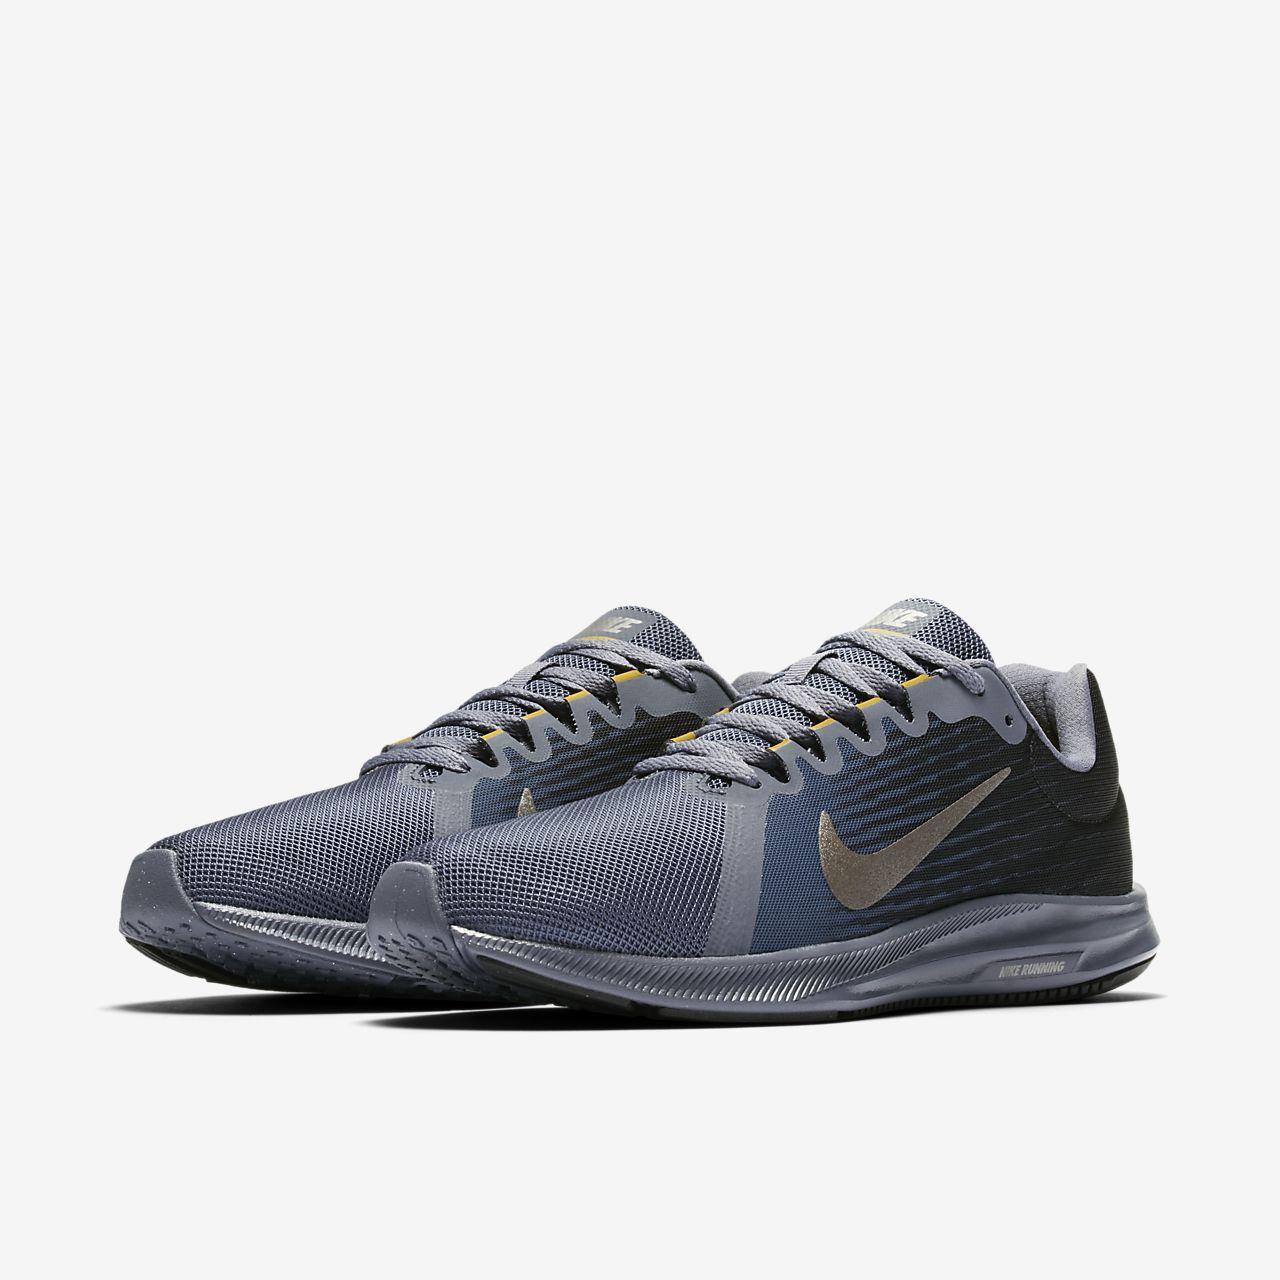 Designer Nike DamenHerren Wmns Air Max 90 Essential 616730